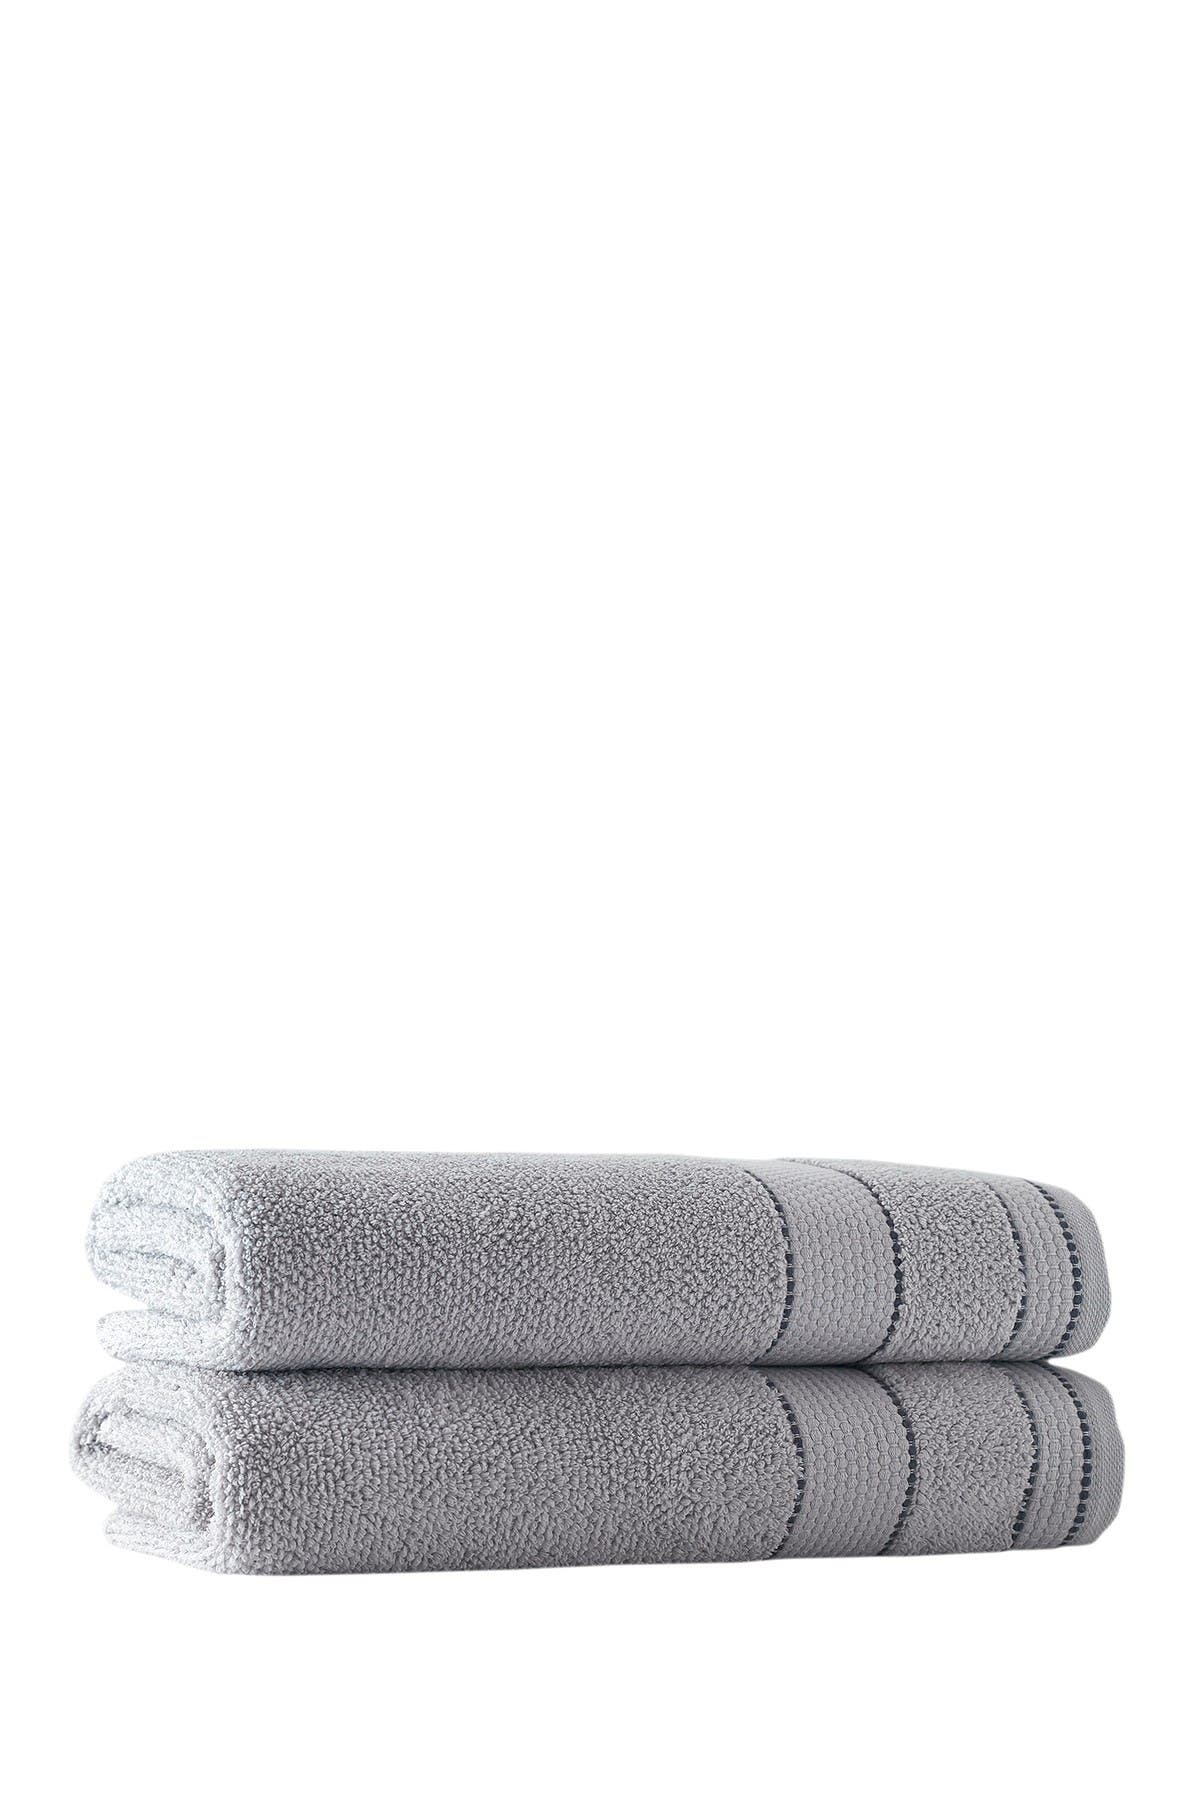 Enchante Home Monroe Turkish Cotton Bath Sheet Silver Set Of 2 Nordstrom Rack